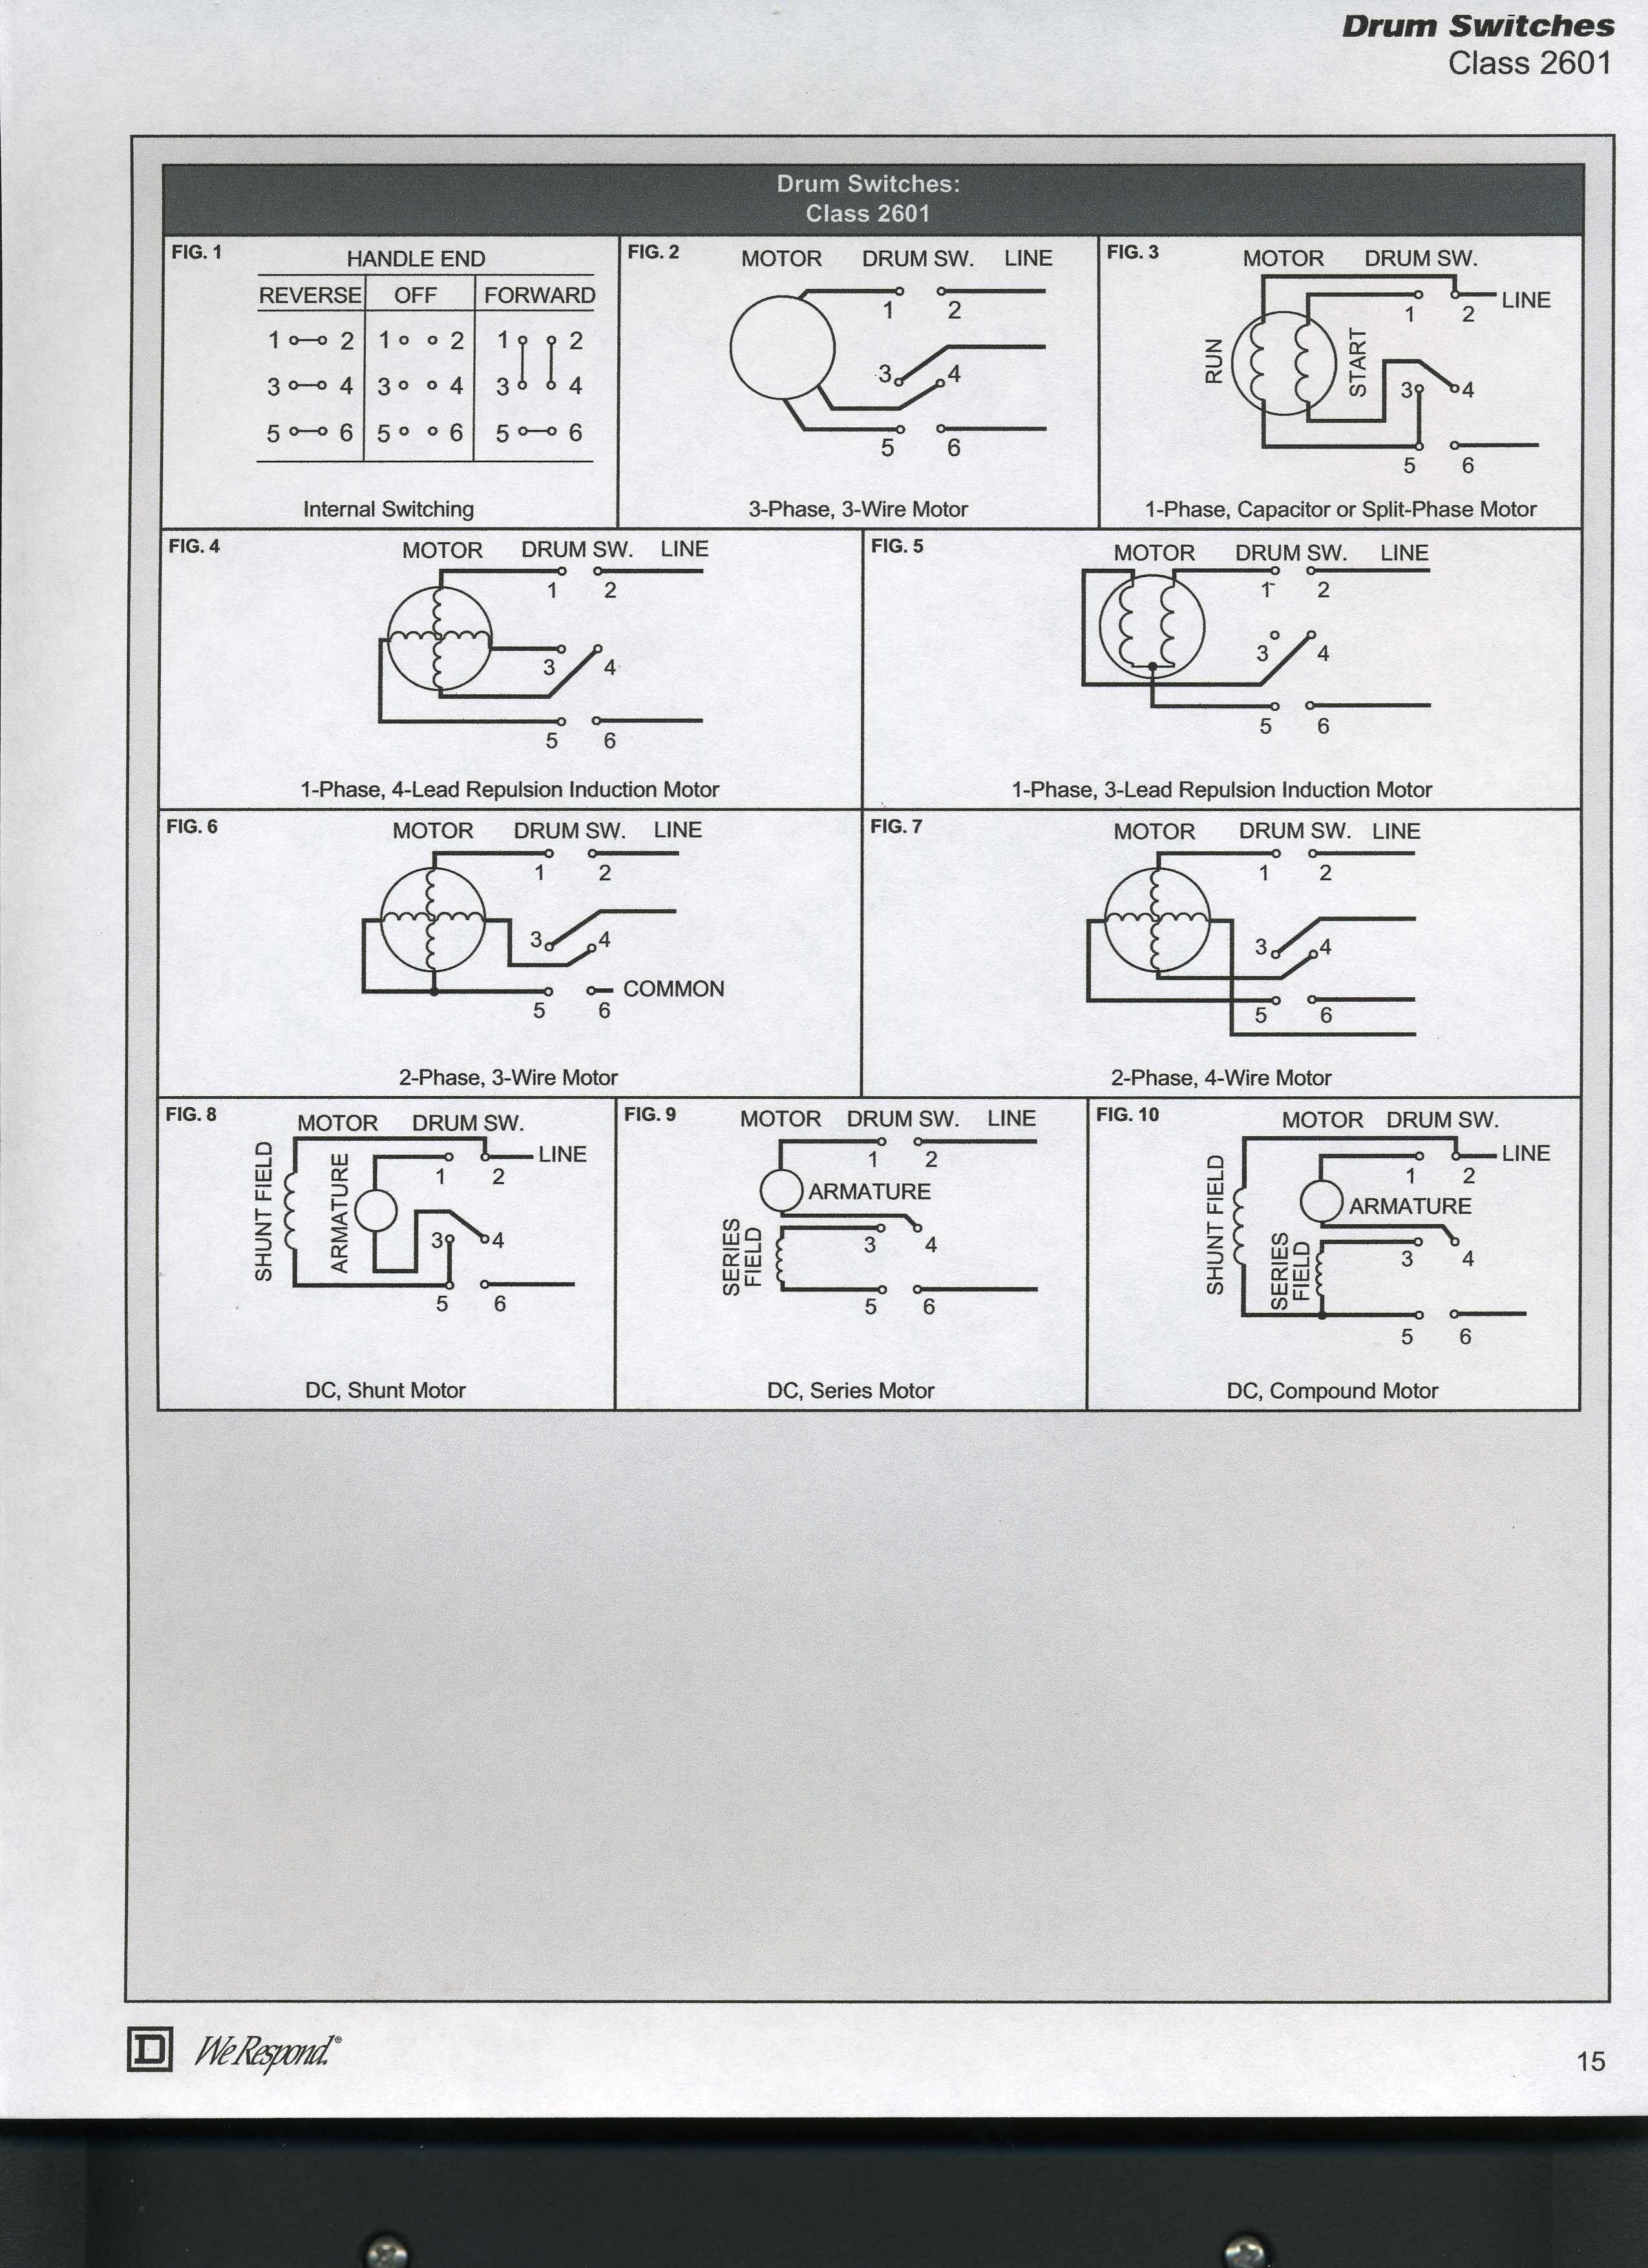 unique wiring diagram baldor electric motor diagram diagramsampleunique wiring diagram baldor electric motor diagram diagramsample diagramtemplate [ 2550 x 3509 Pixel ]